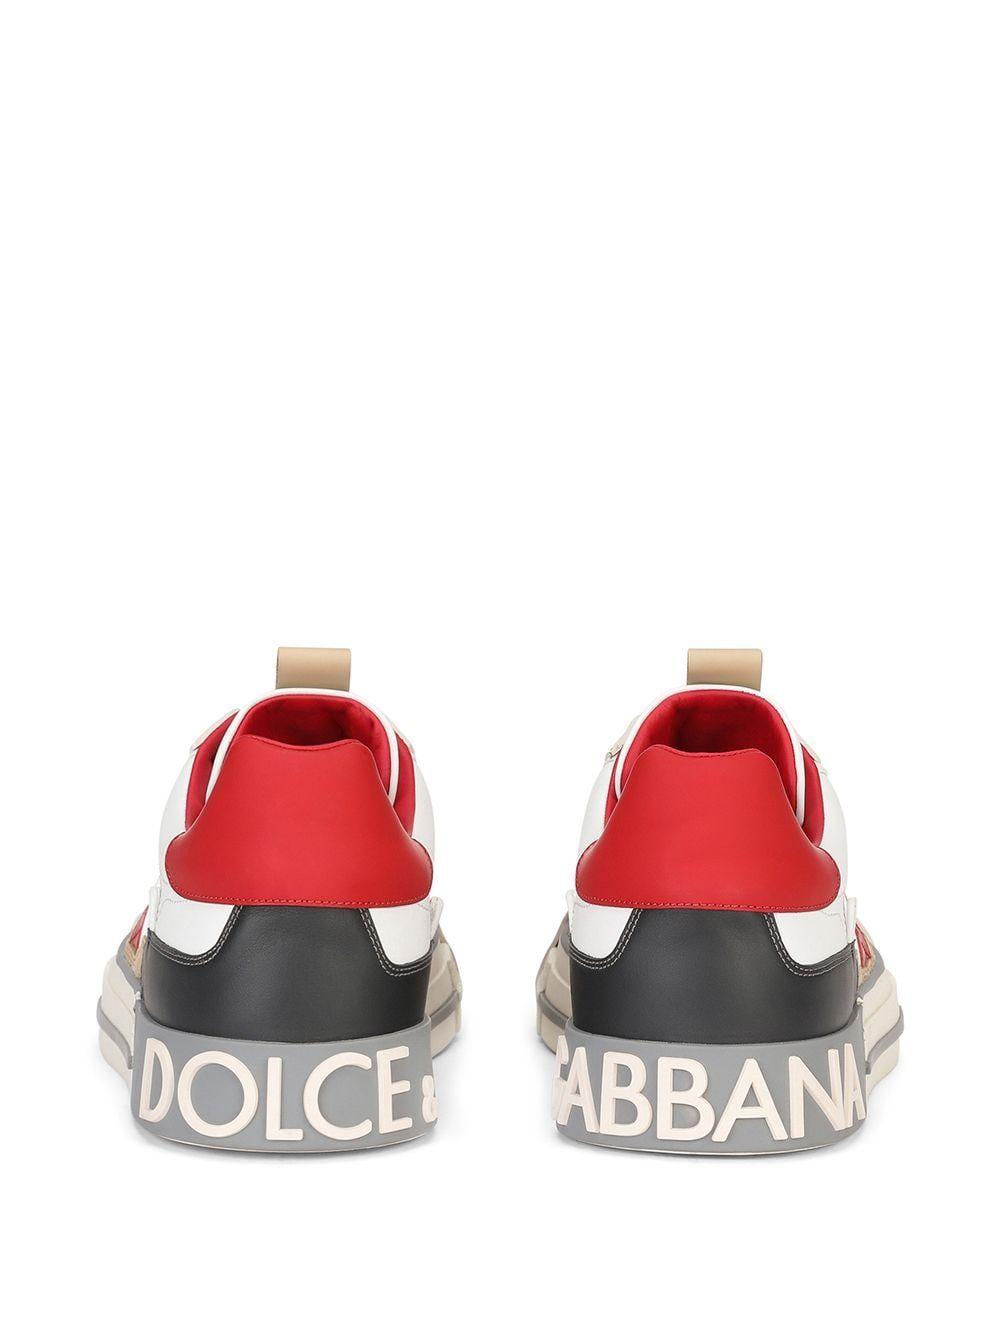 Sneaker - Dolce & Gabbana